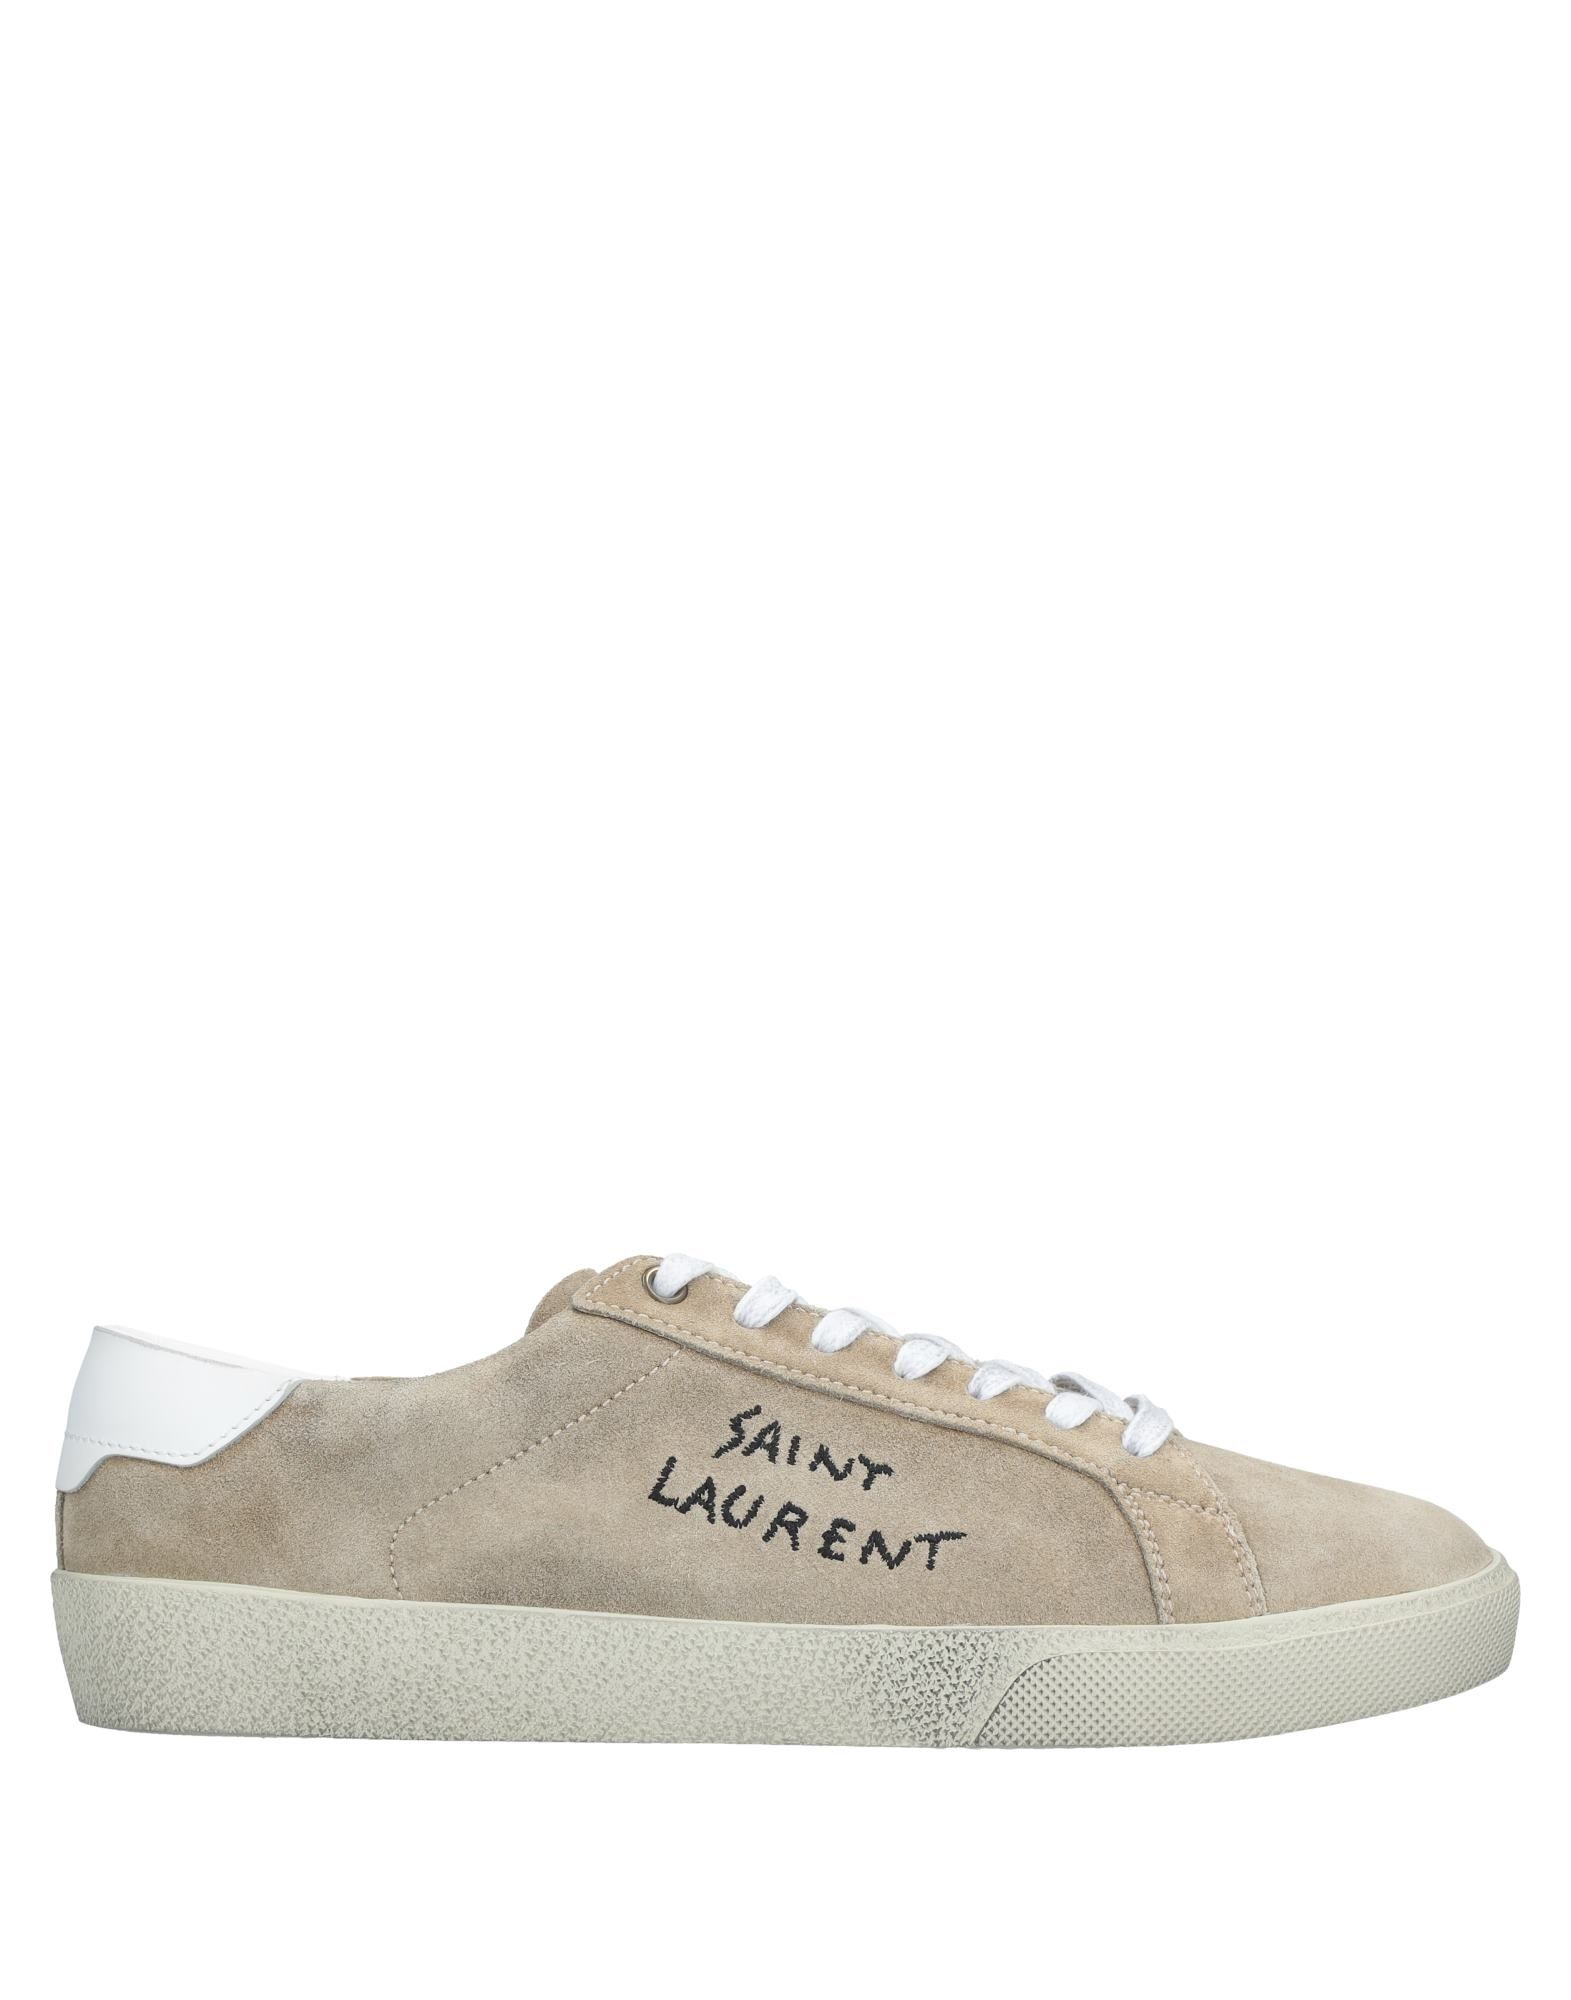 b4a5db218f7 Saint Laurent Sneakers - Men Saint Laurent Sneakers online on YOOX United  States - 11538010